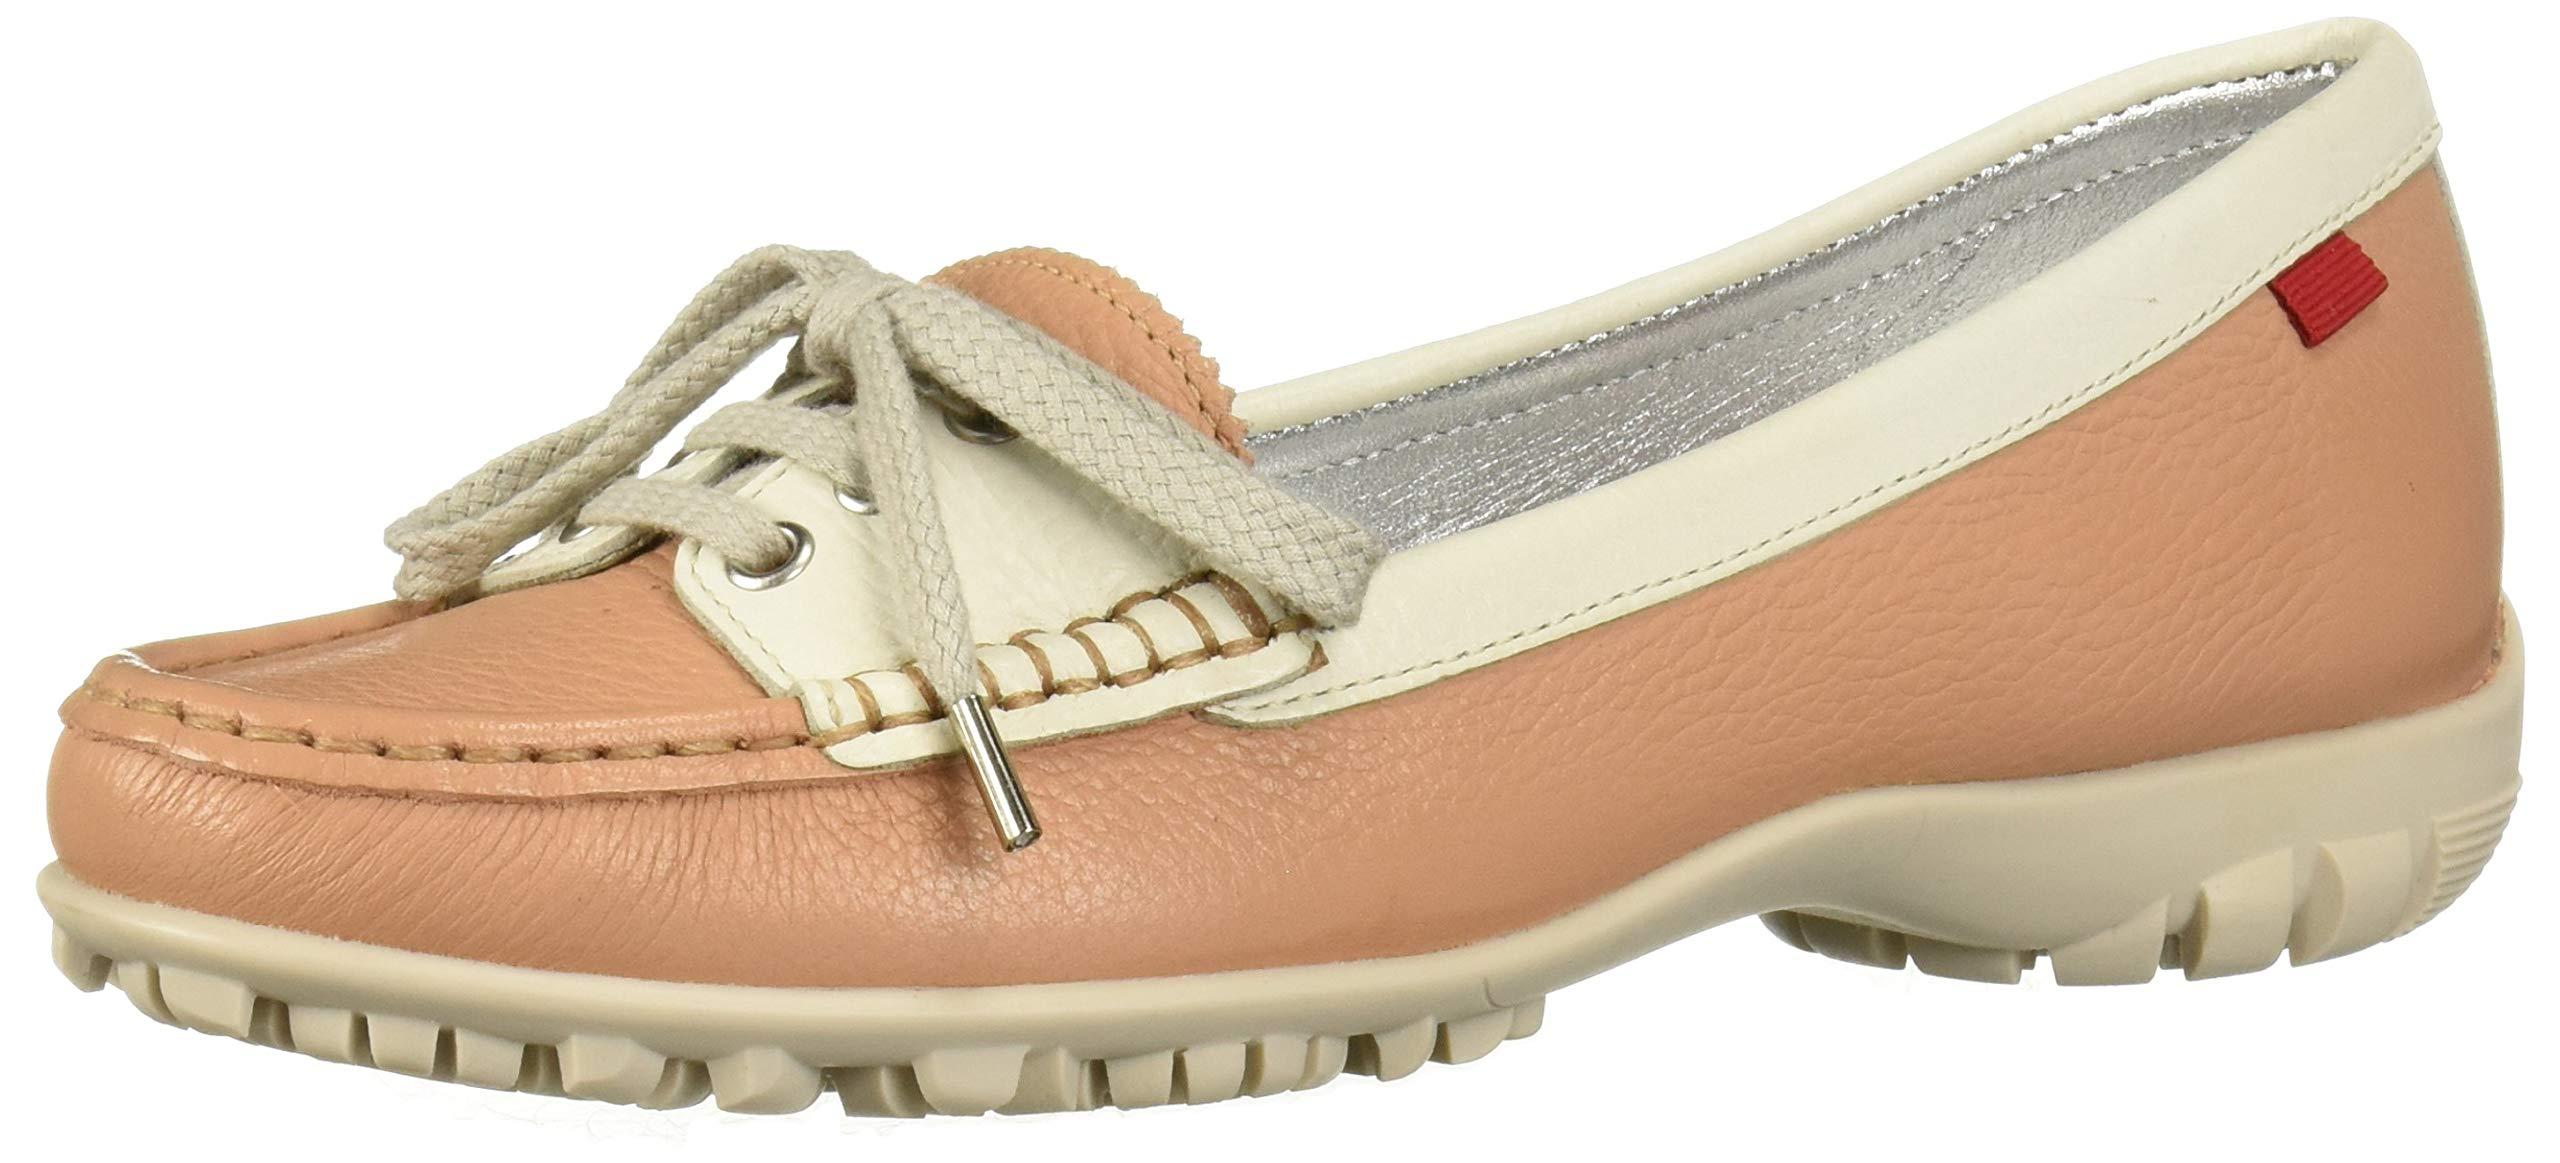 MARC JOSEPH NEW YORK Womens Leather Made in Brazil Liberty Golf Shoe, café Cream Grainy, 6 M US by MARC JOSEPH NEW YORK